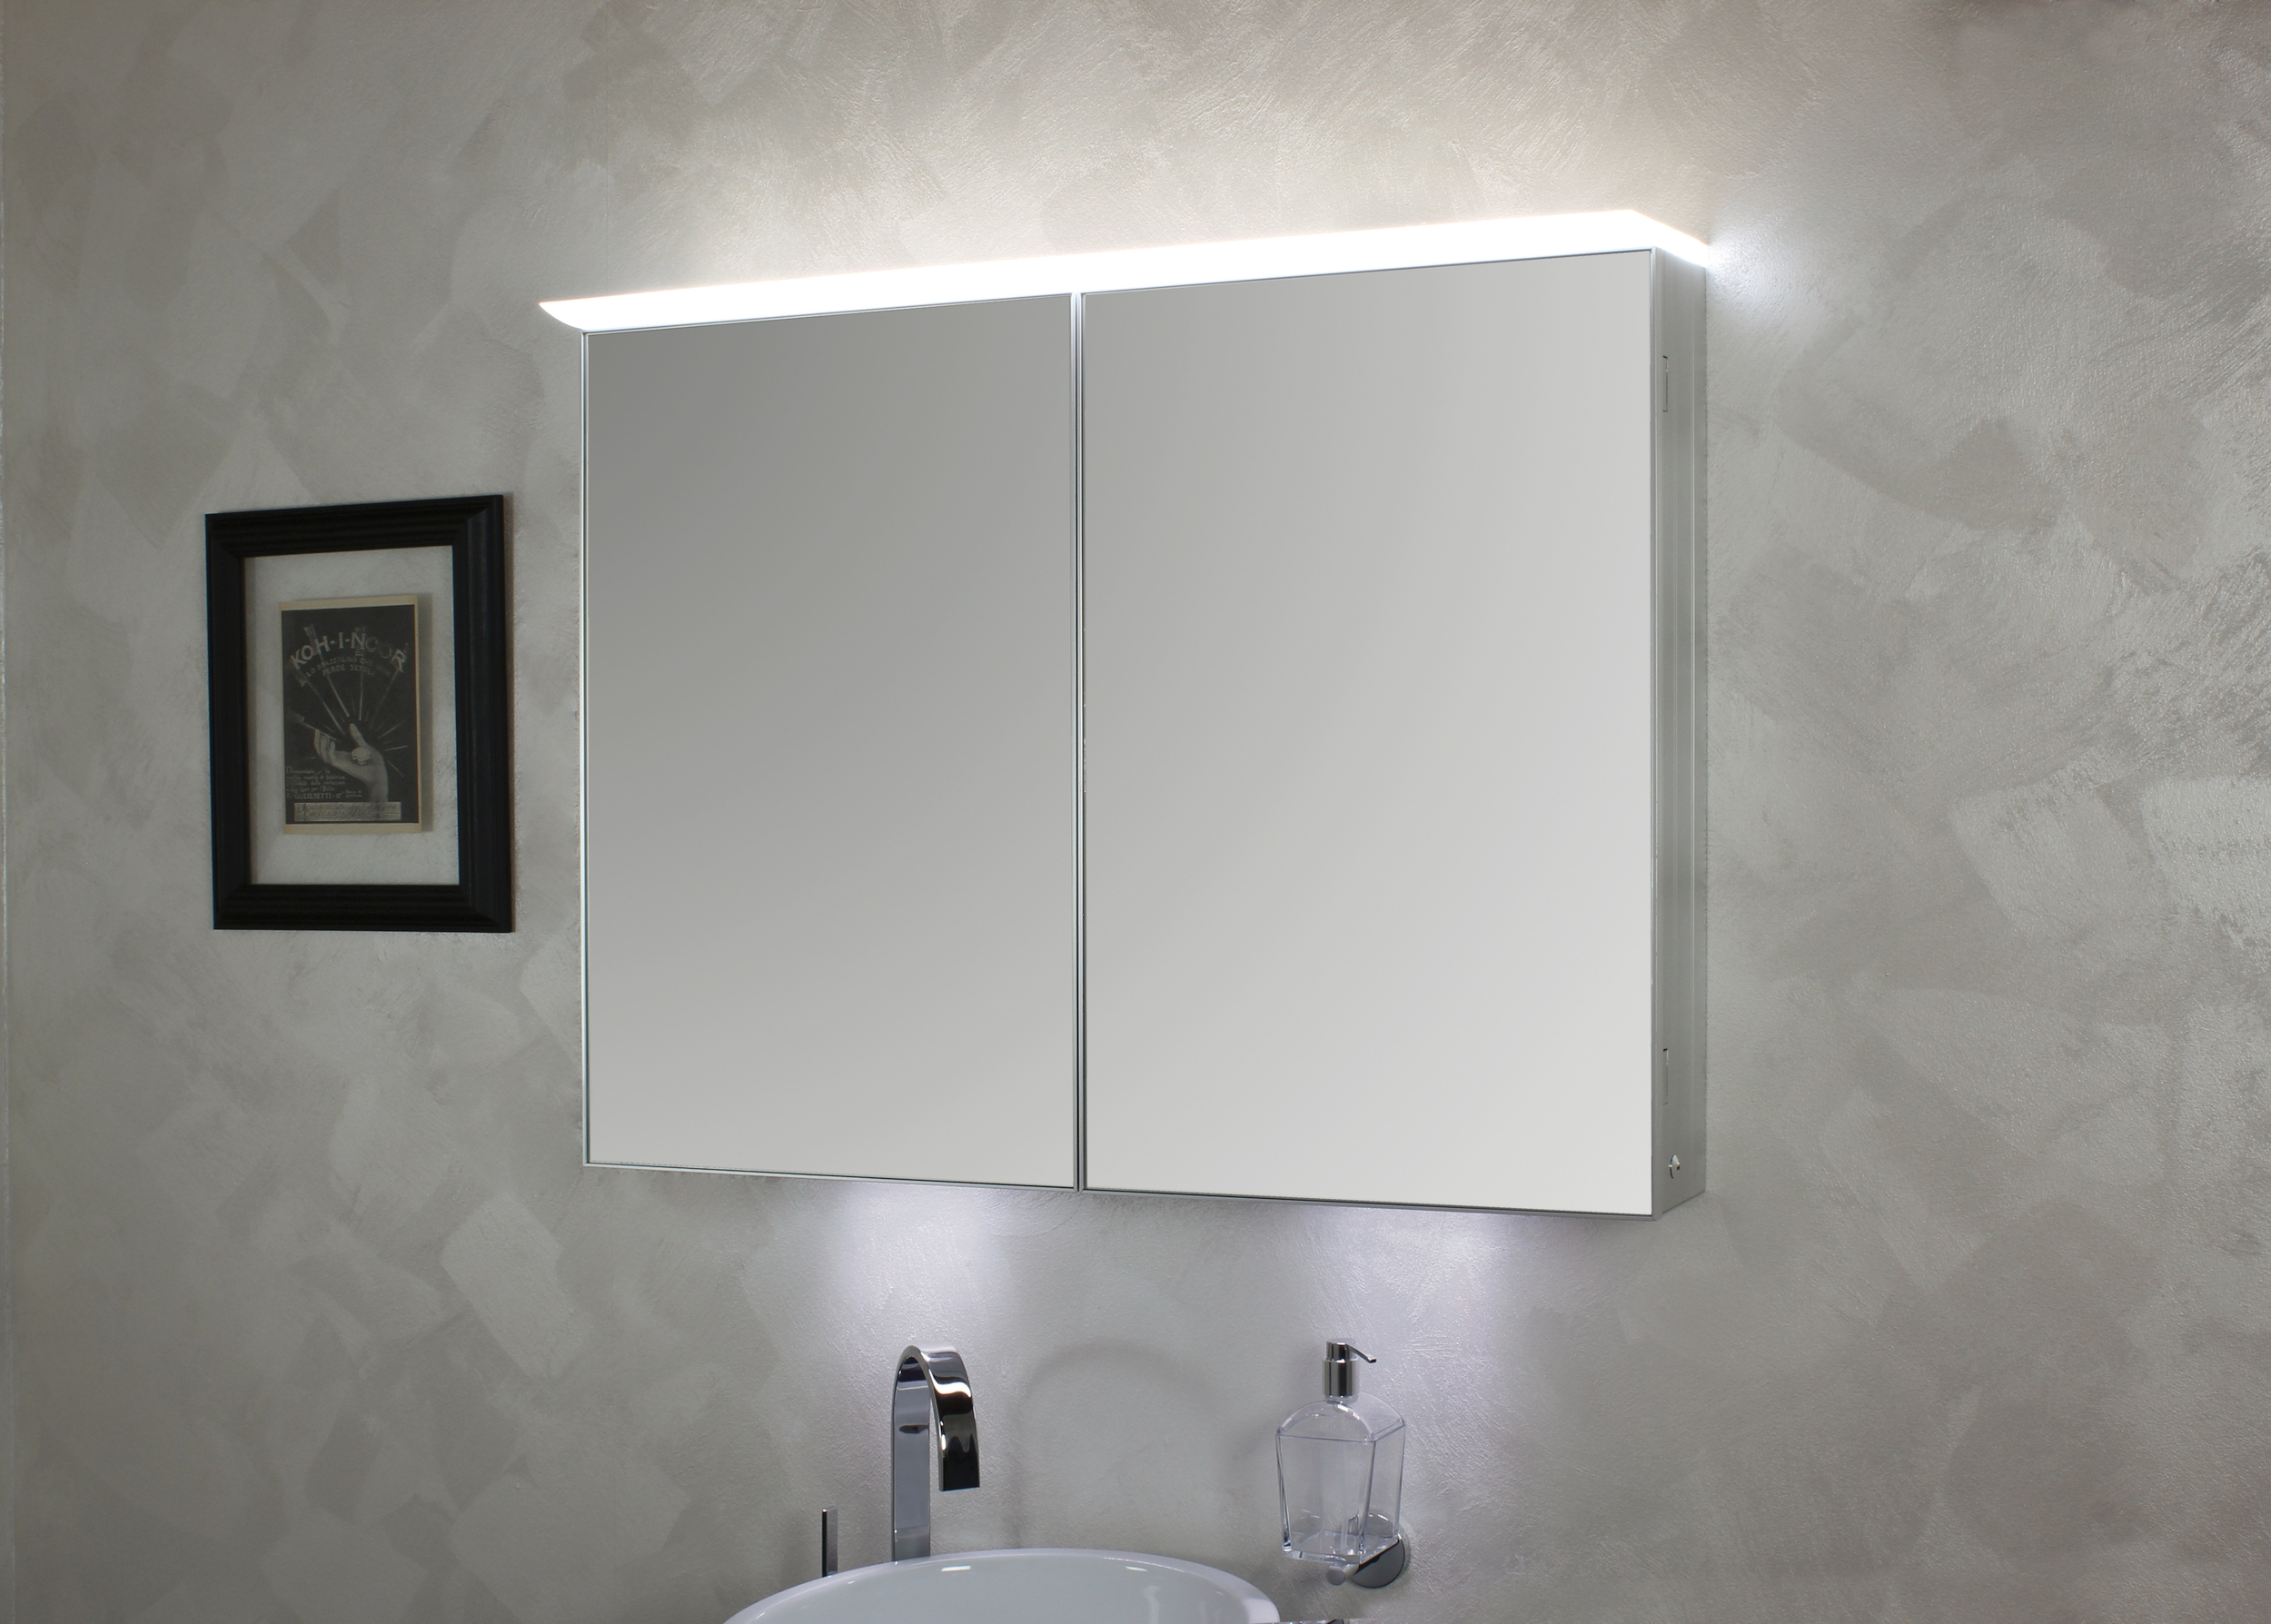 koh i noor top spiegelschrank mit diffuser led beleuchtung 900 x 125 x 700 mm eloxiert 45306. Black Bedroom Furniture Sets. Home Design Ideas